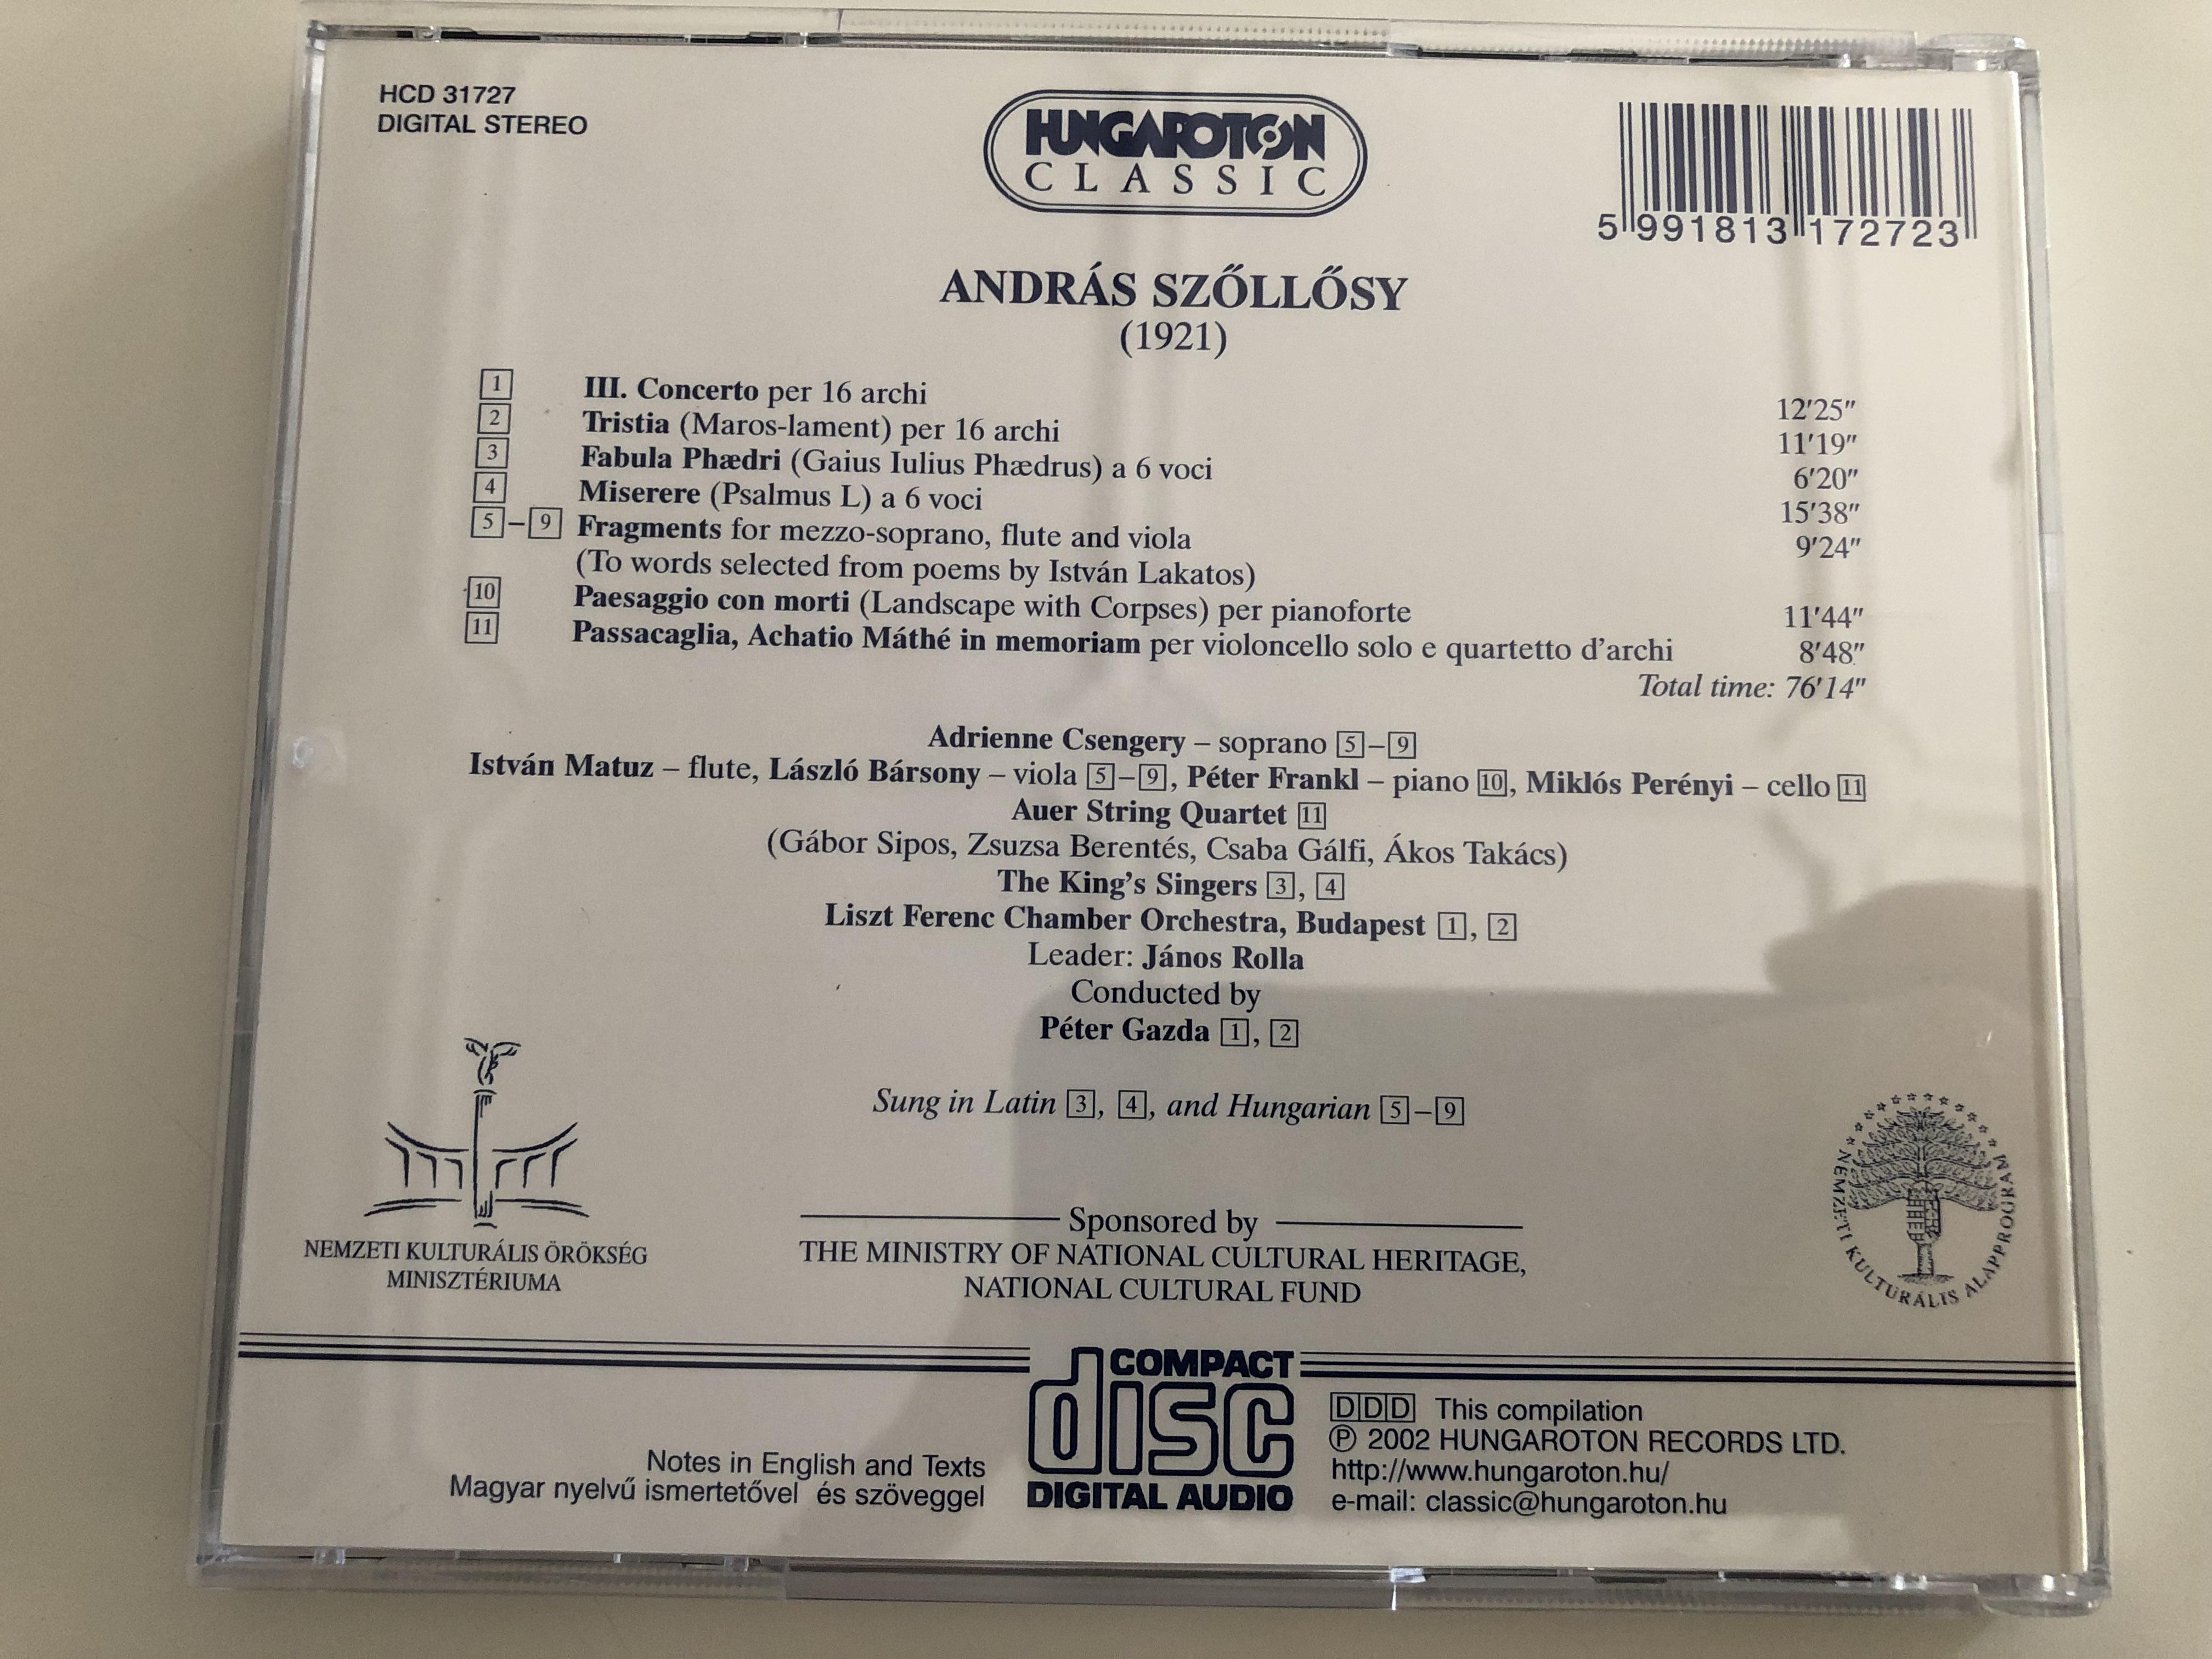 andr-s-sz-ll-sy-concerto-no-3-tristia-fabula-ph-dri-miserere-psalmus-l-hungaroton-classic-audio-cd-2002-hcd-31727-10-.jpg